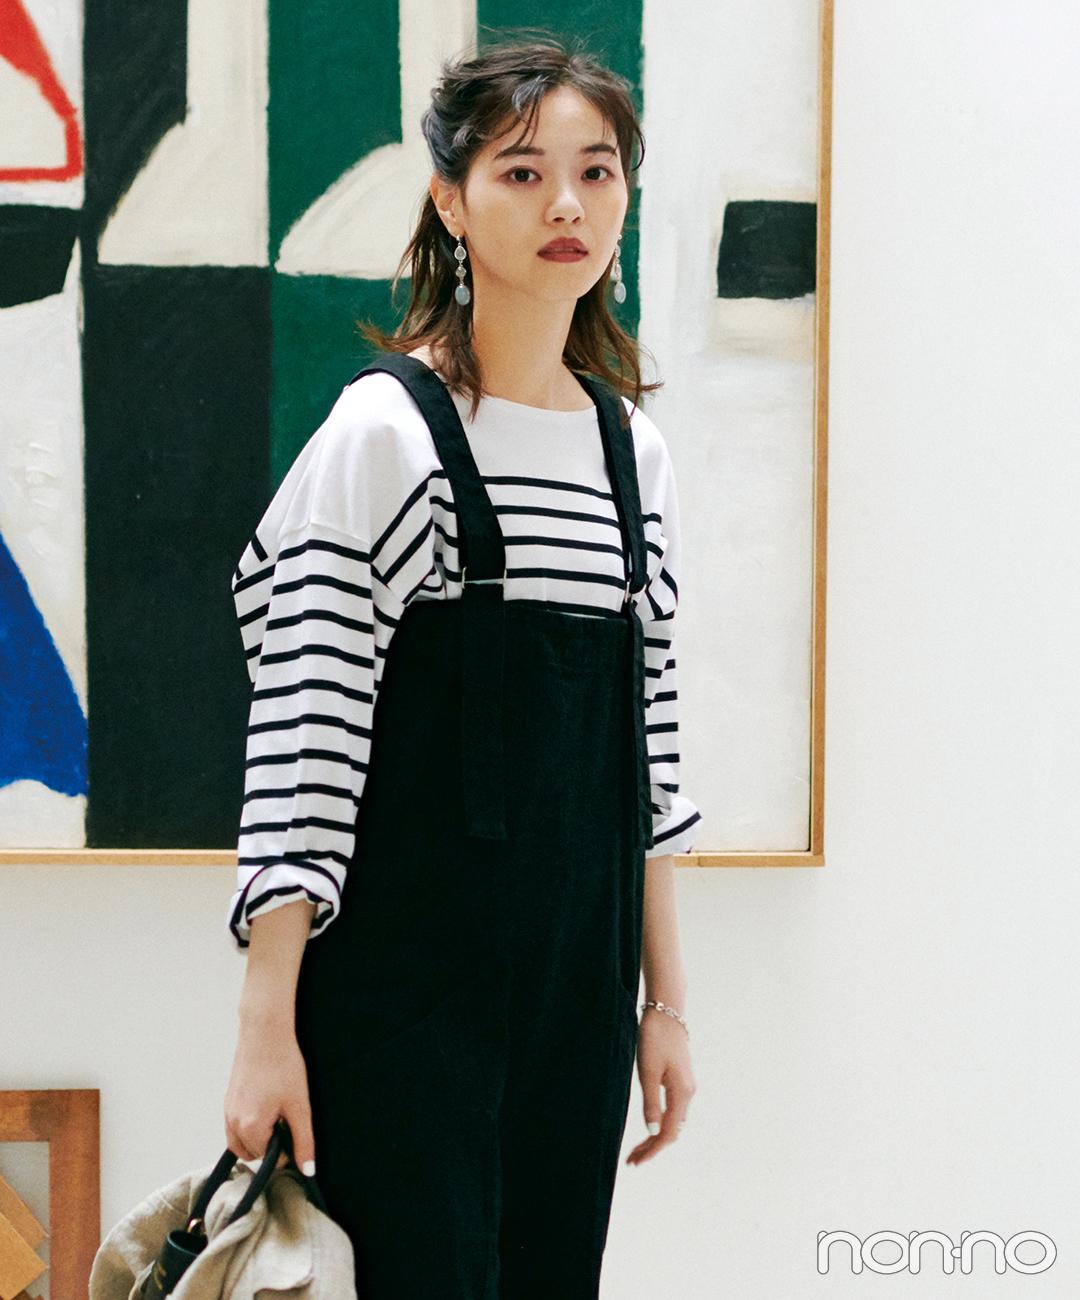 Photo Gallery|モデル・西野七瀬の最新フォトギャラリーを見る_1_13